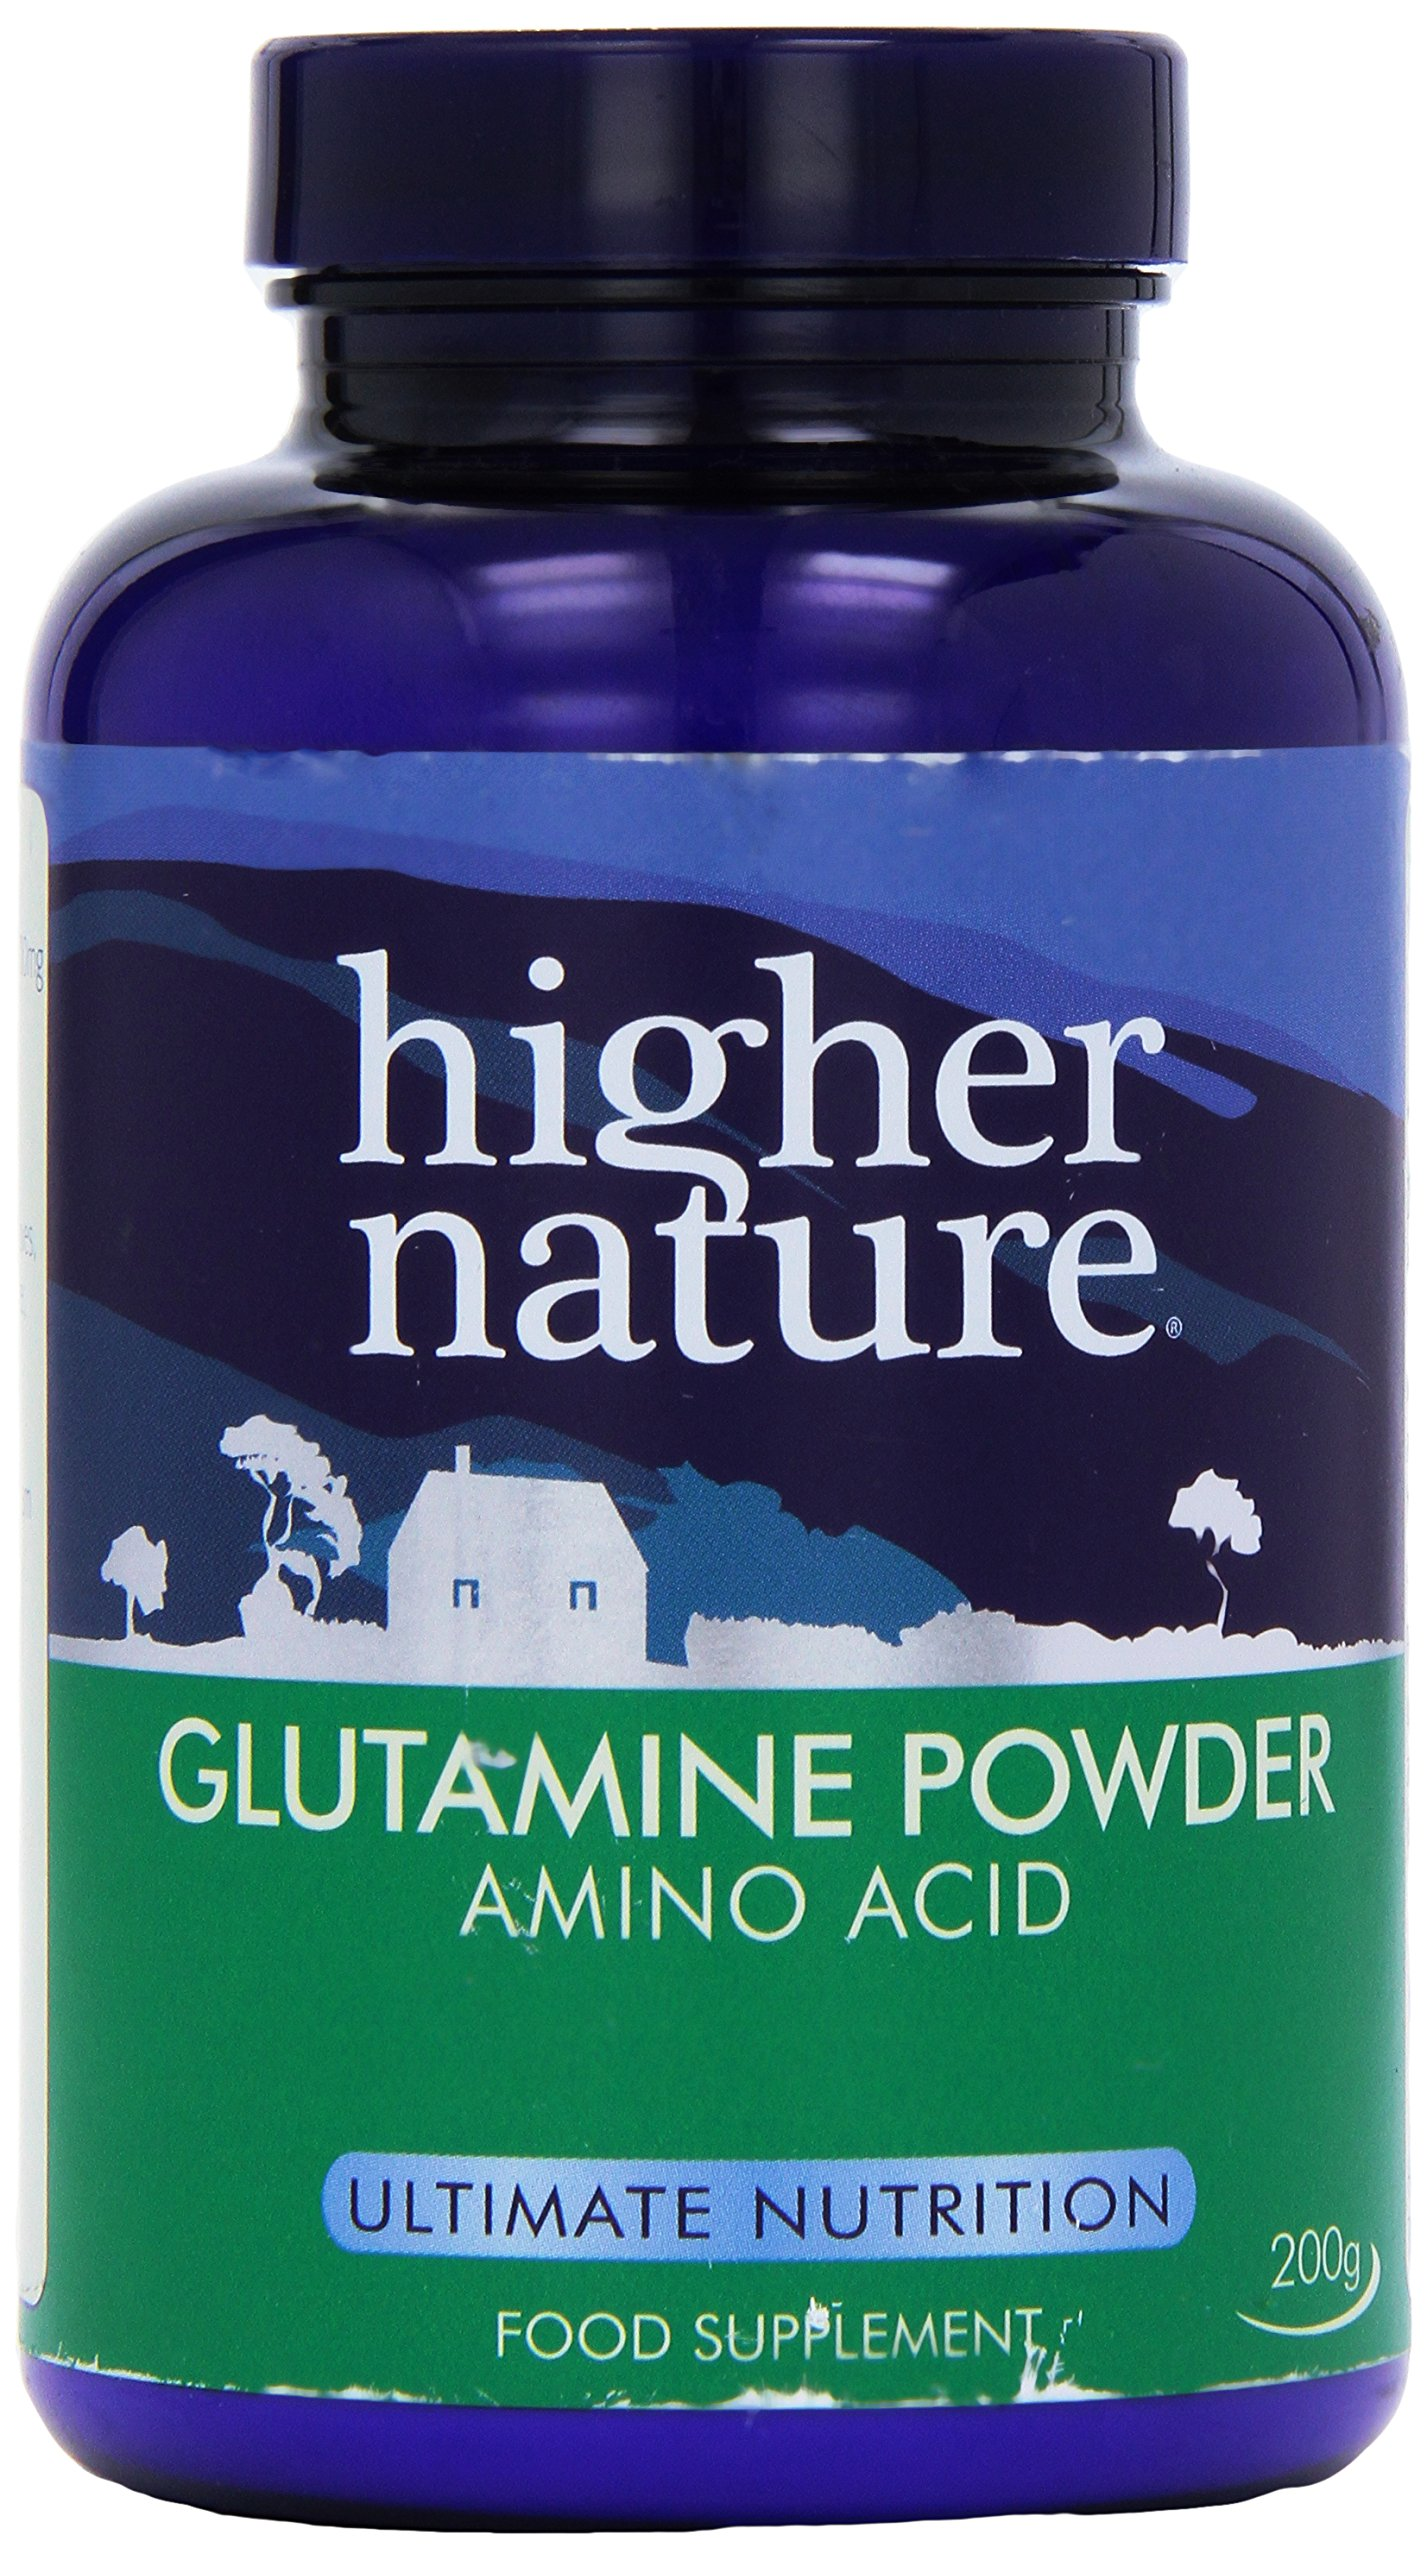 812LuLBiikL - Higher Nature 200g Glutamine Powder